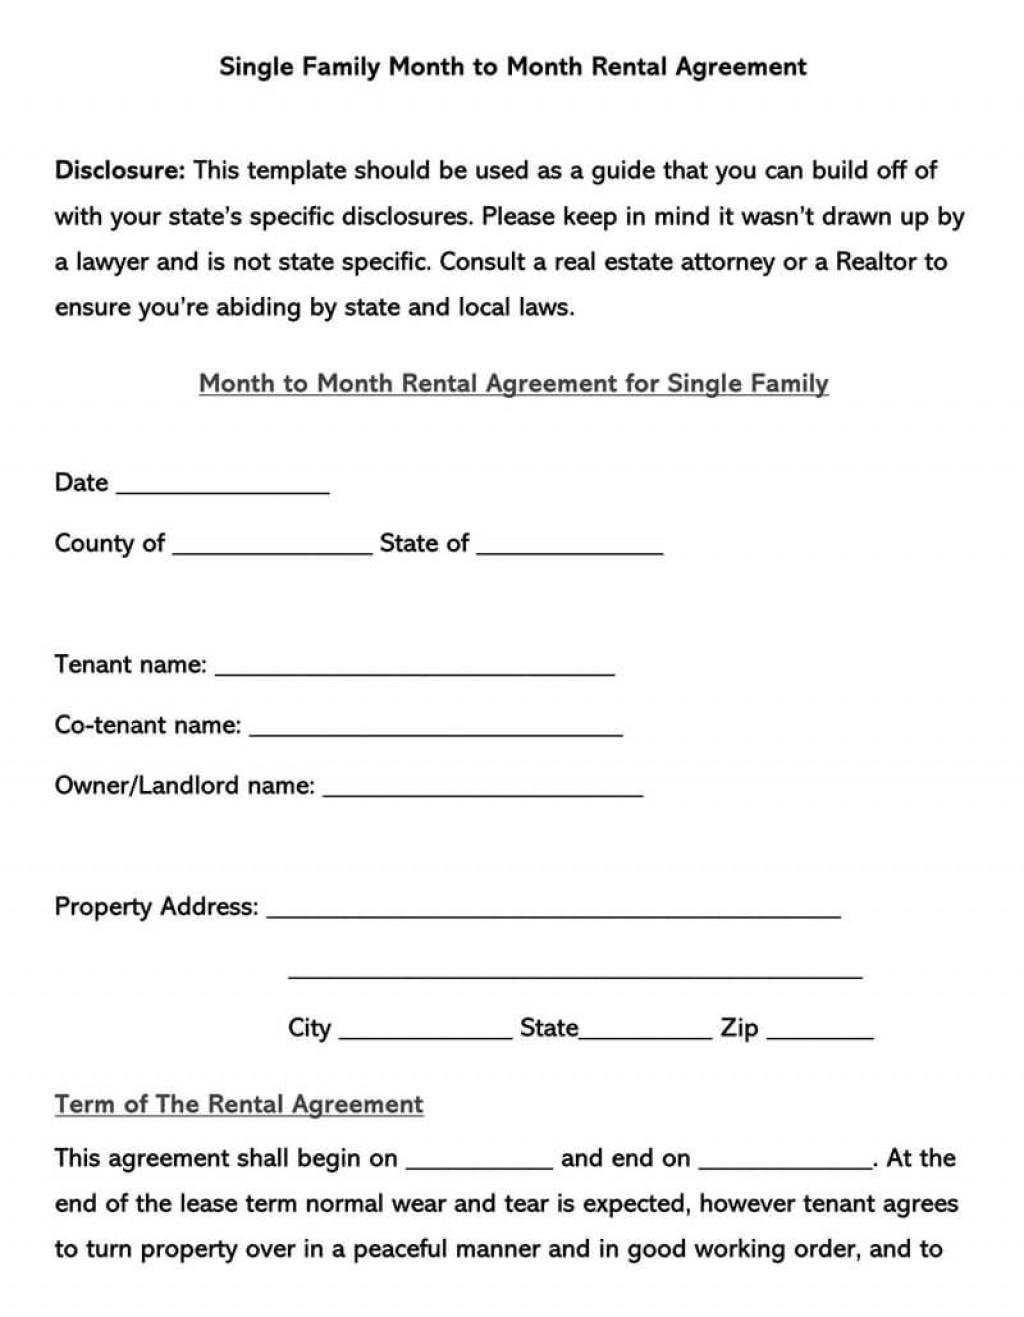 008 Impressive Rental Agreement Contract Free Download Design  Tenancy Form Uk House EquipmentLarge